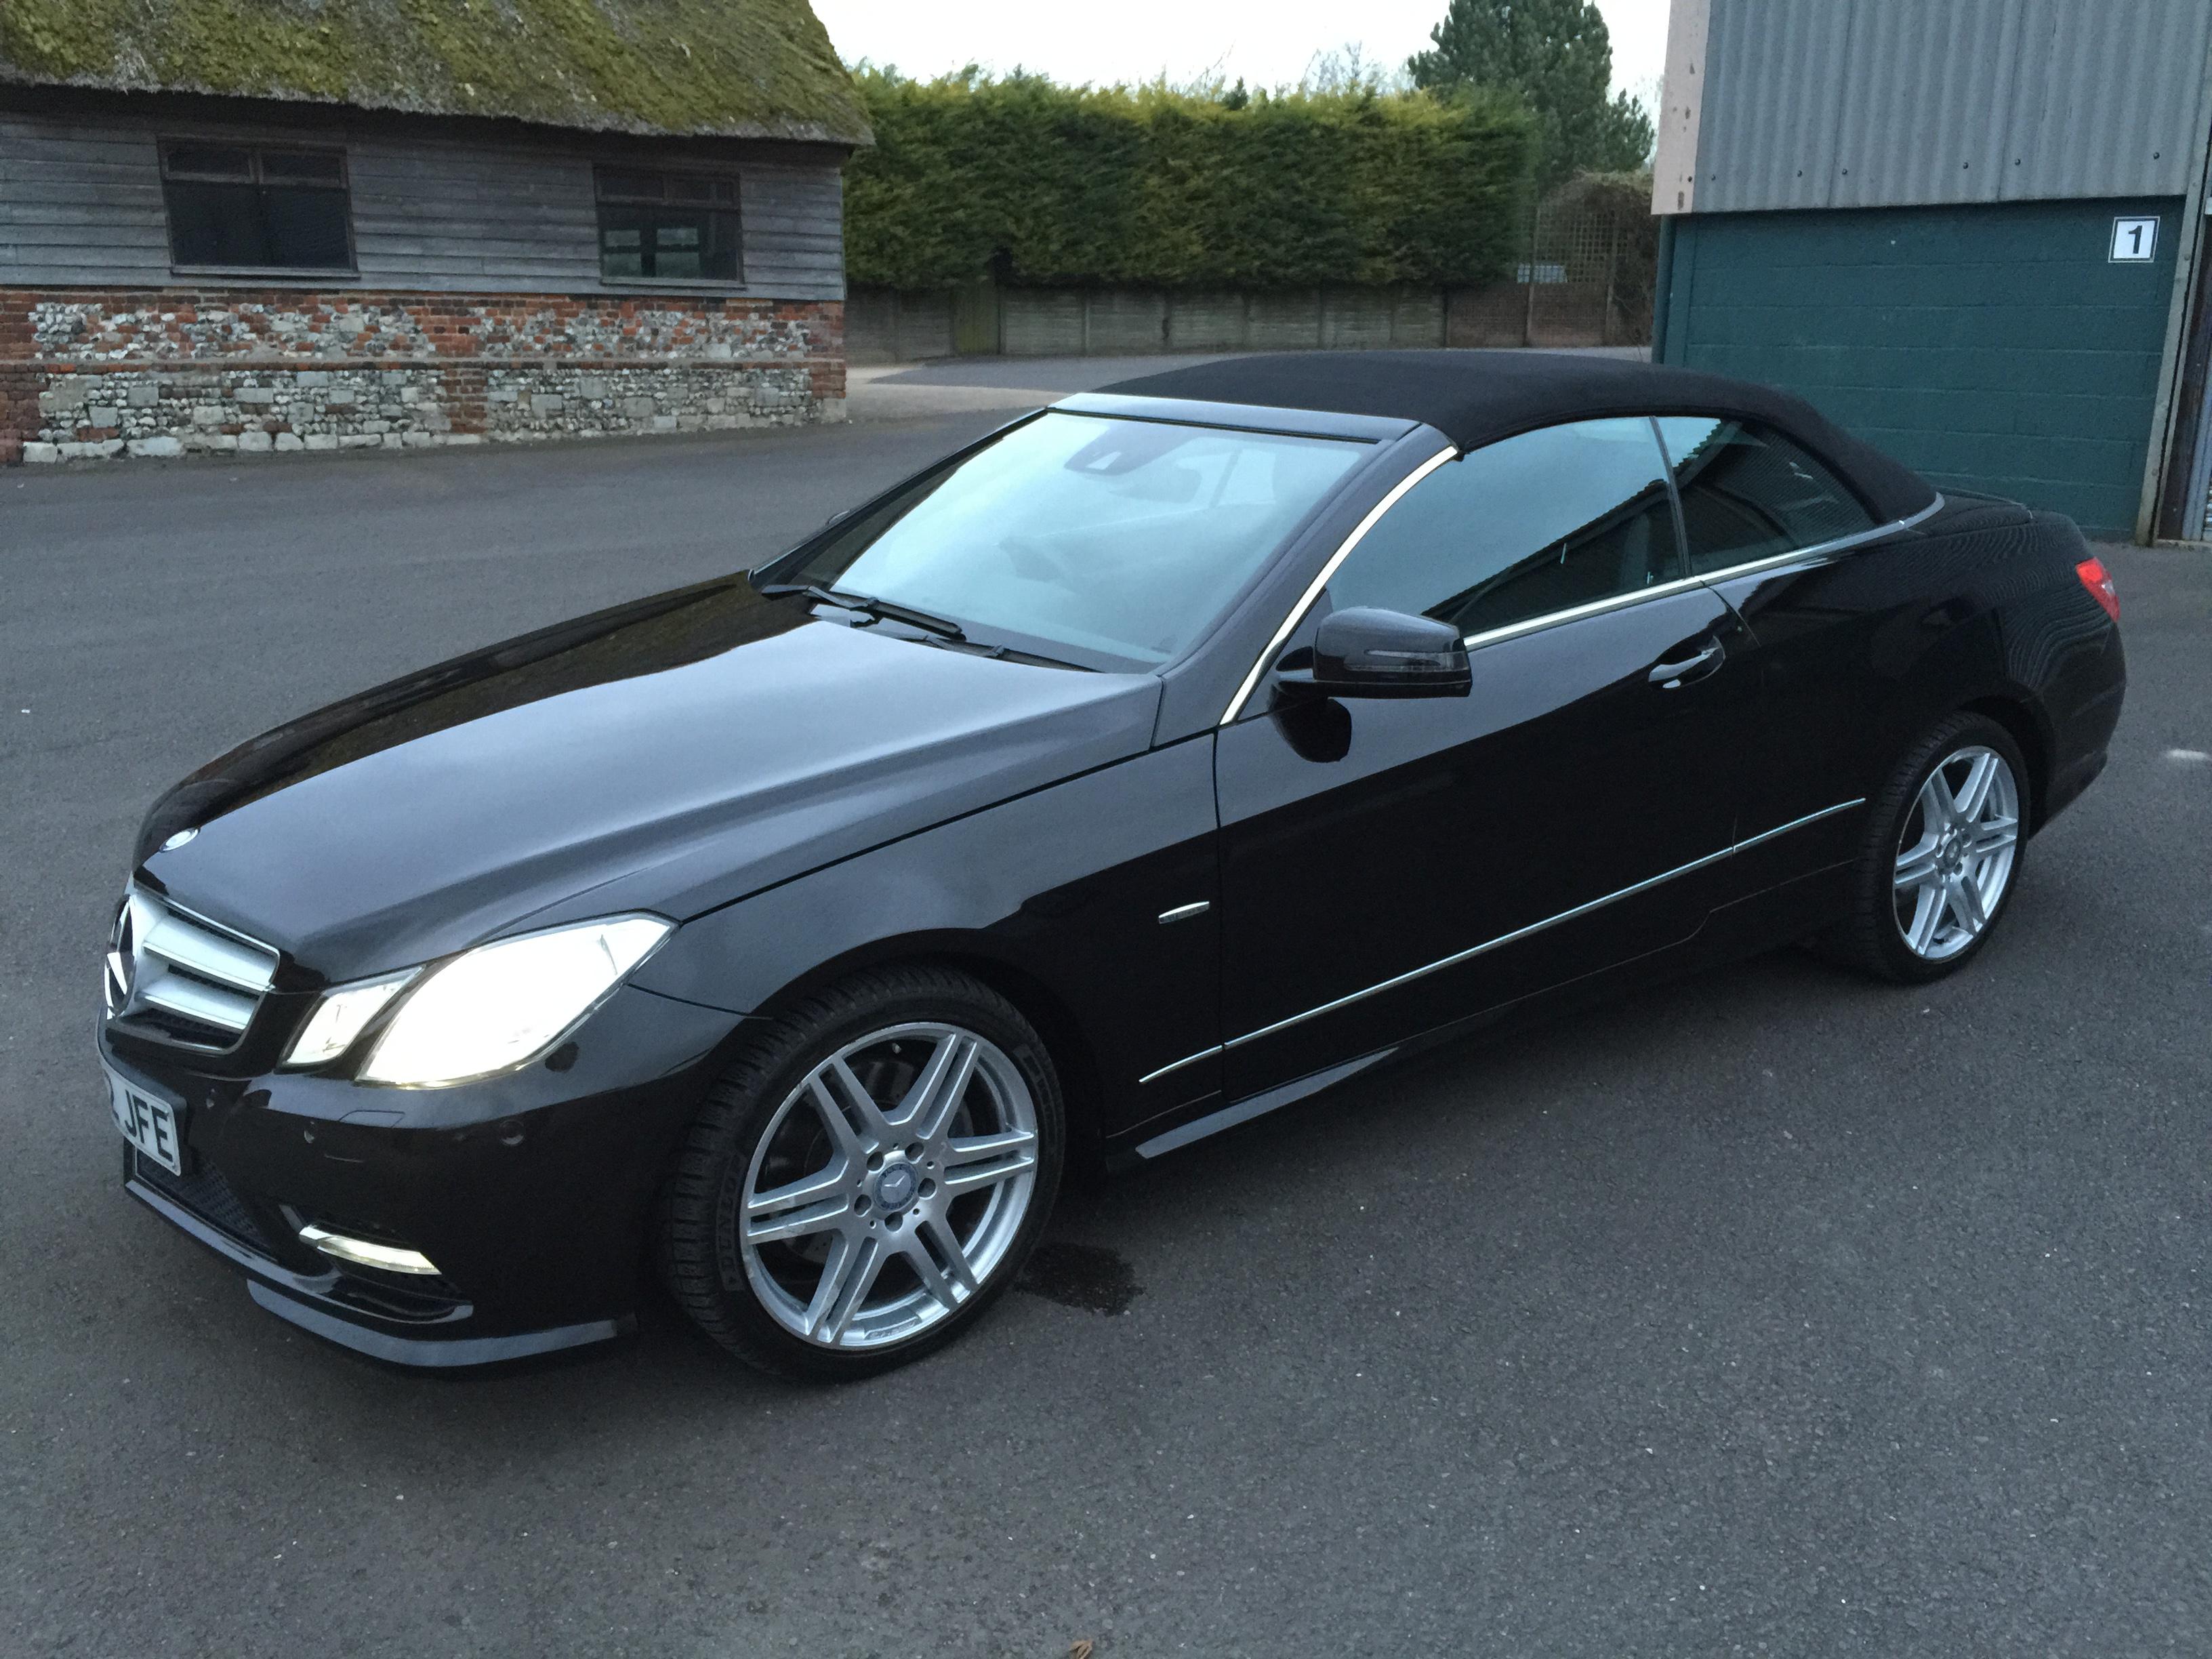 Mercedes benz e class 2 1 e250 cdi amg sport 7g tronic for Mercedes benz e350 black